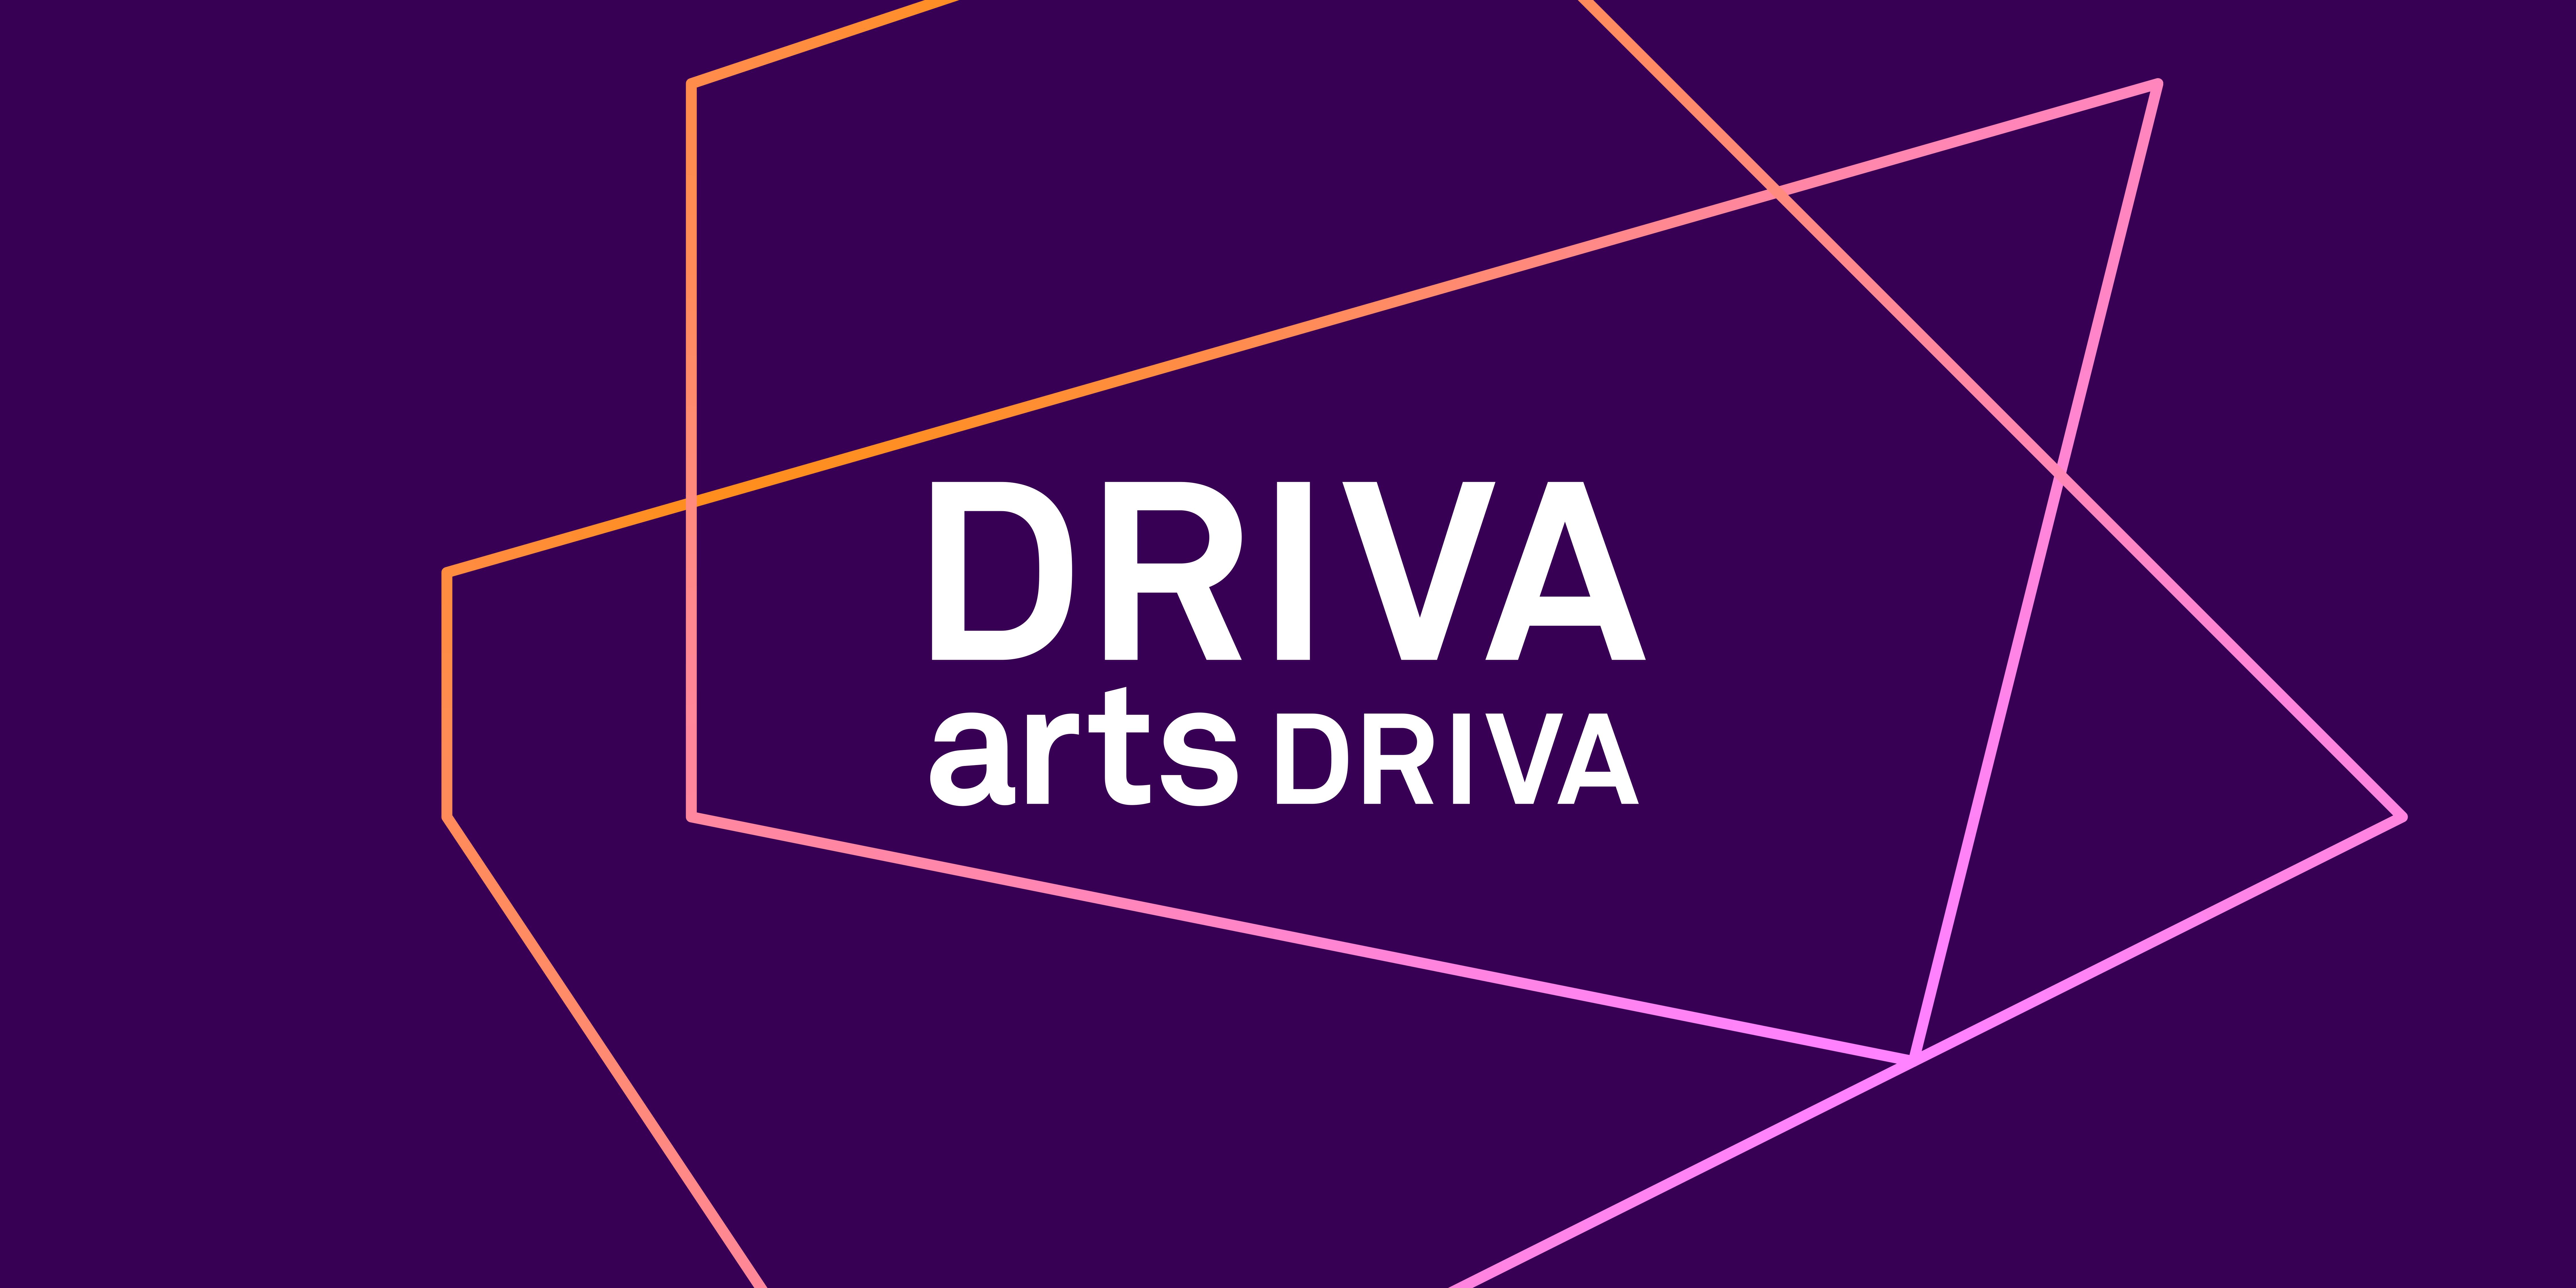 DRIVA Arts DRIVA image